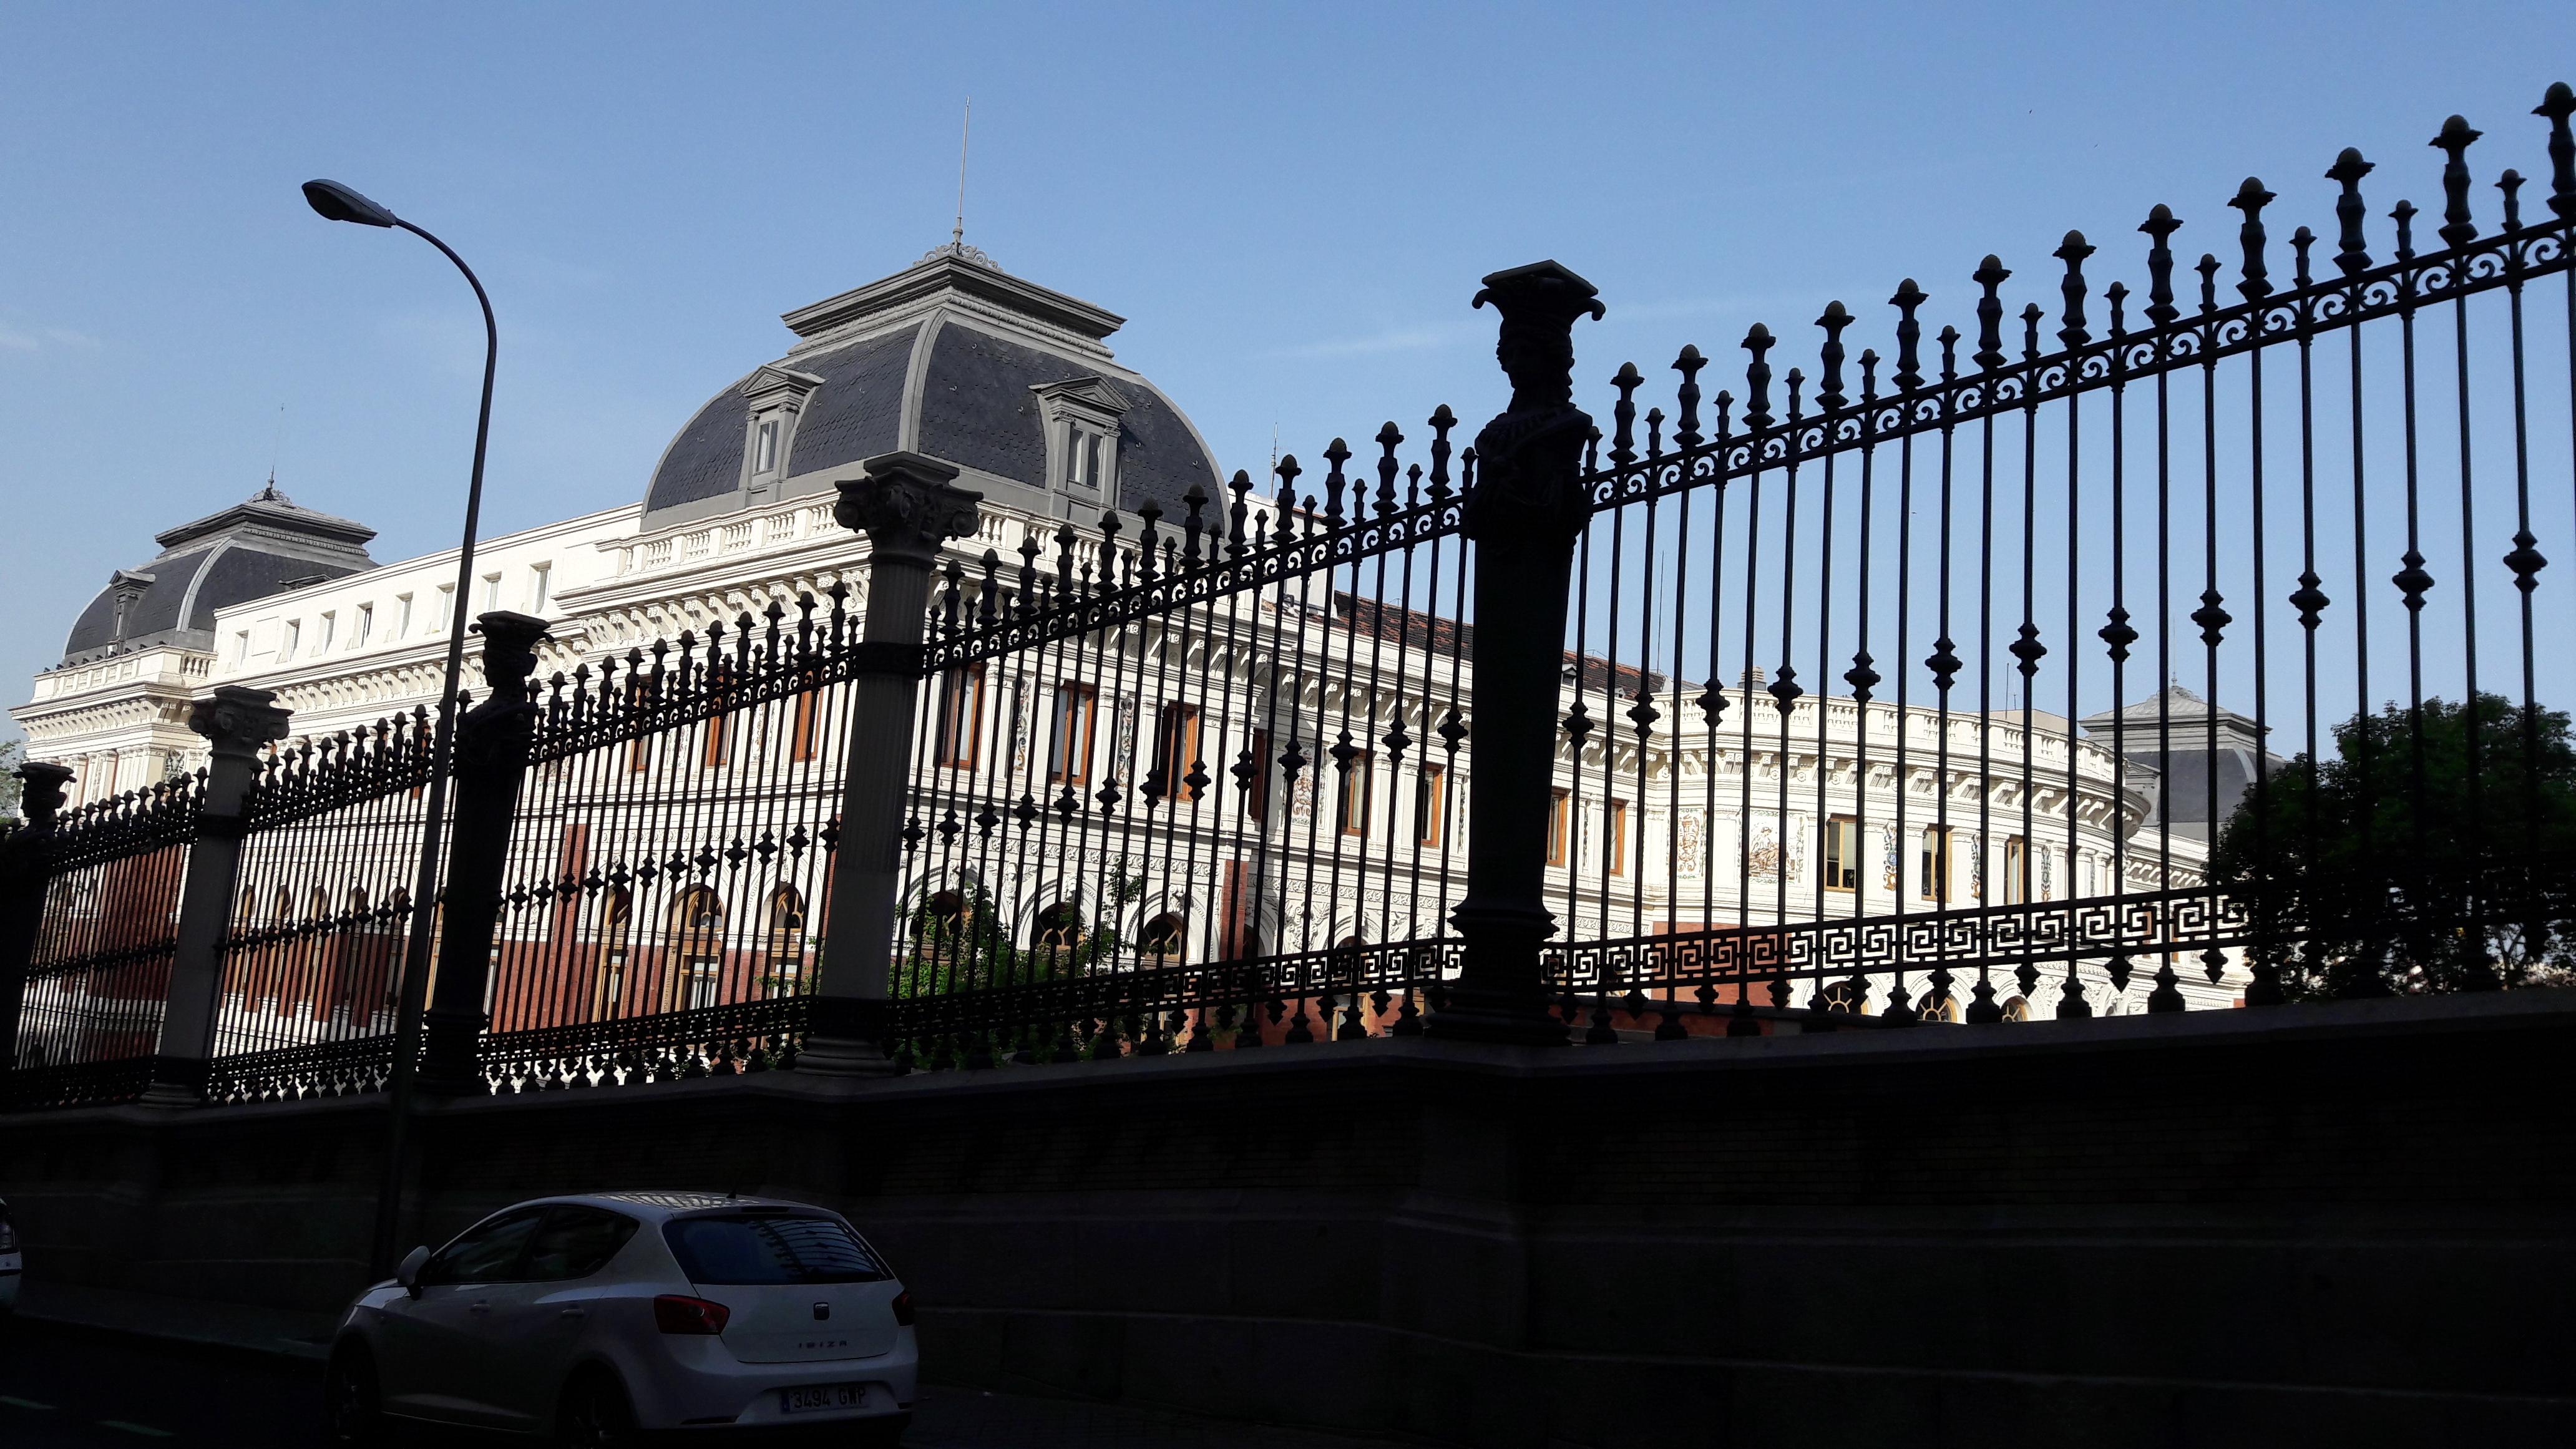 mad-min-agricultura-backside-palacio-de-fomento-apr17